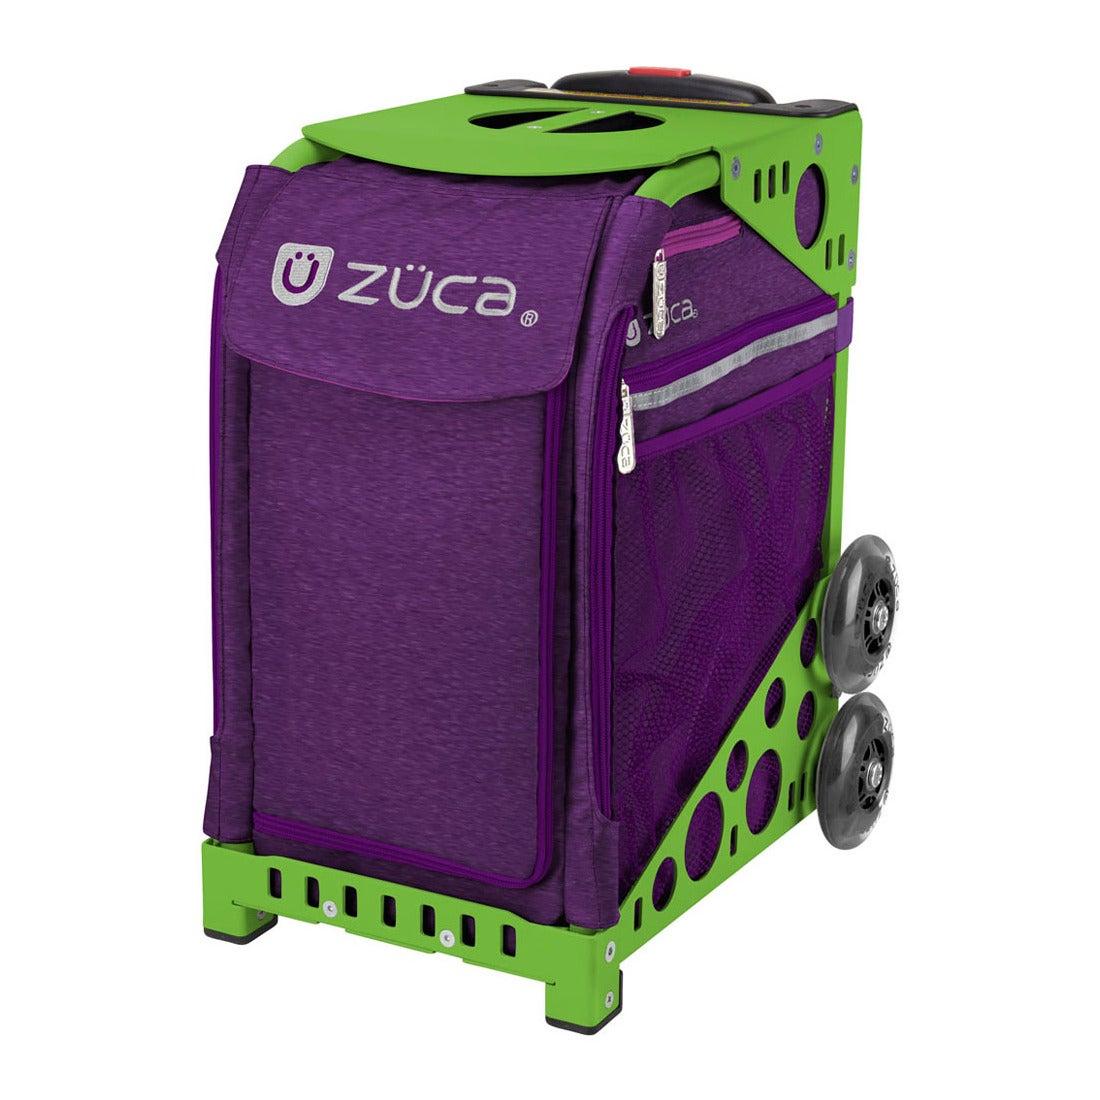 【SAC'S BAR】ZUCA Sport キャリーケース Cosmic Purple 401 Green メンズ